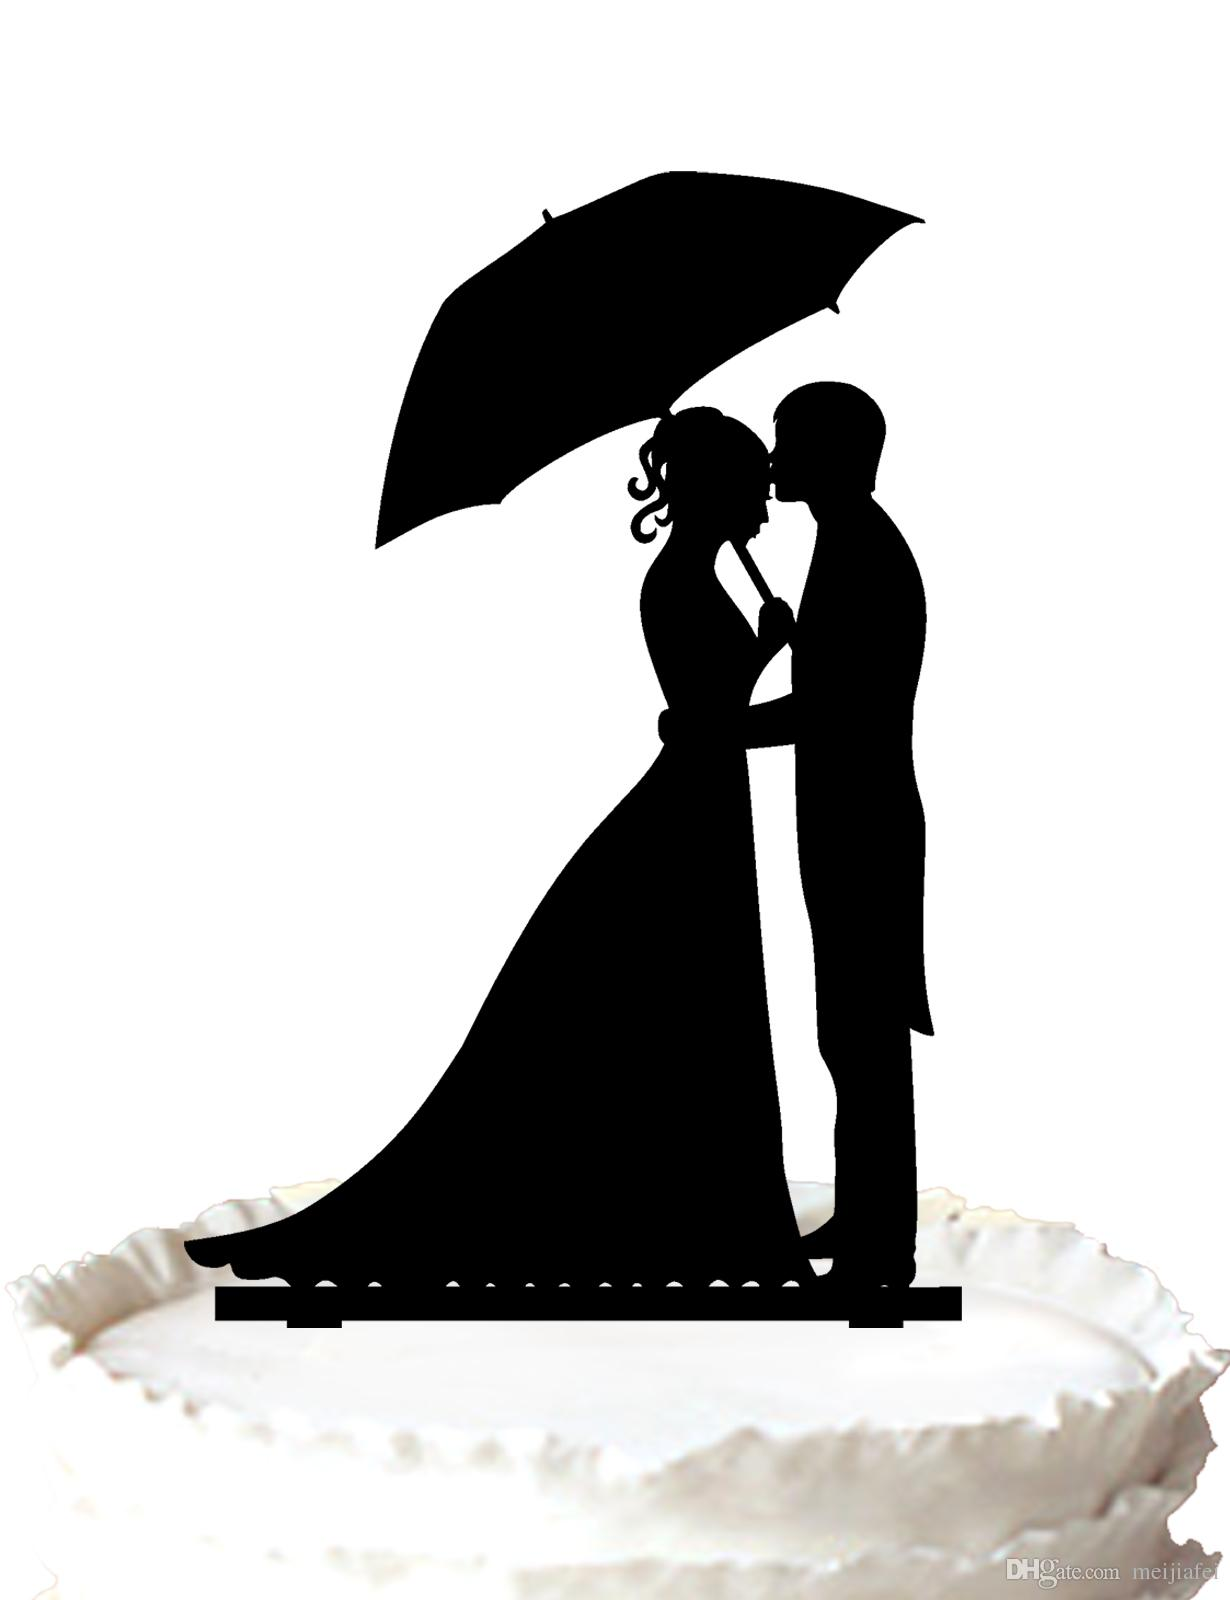 Wedding Centerpiece Umbrella with Cake Topper Bride and Groom Decoration 2 Pc